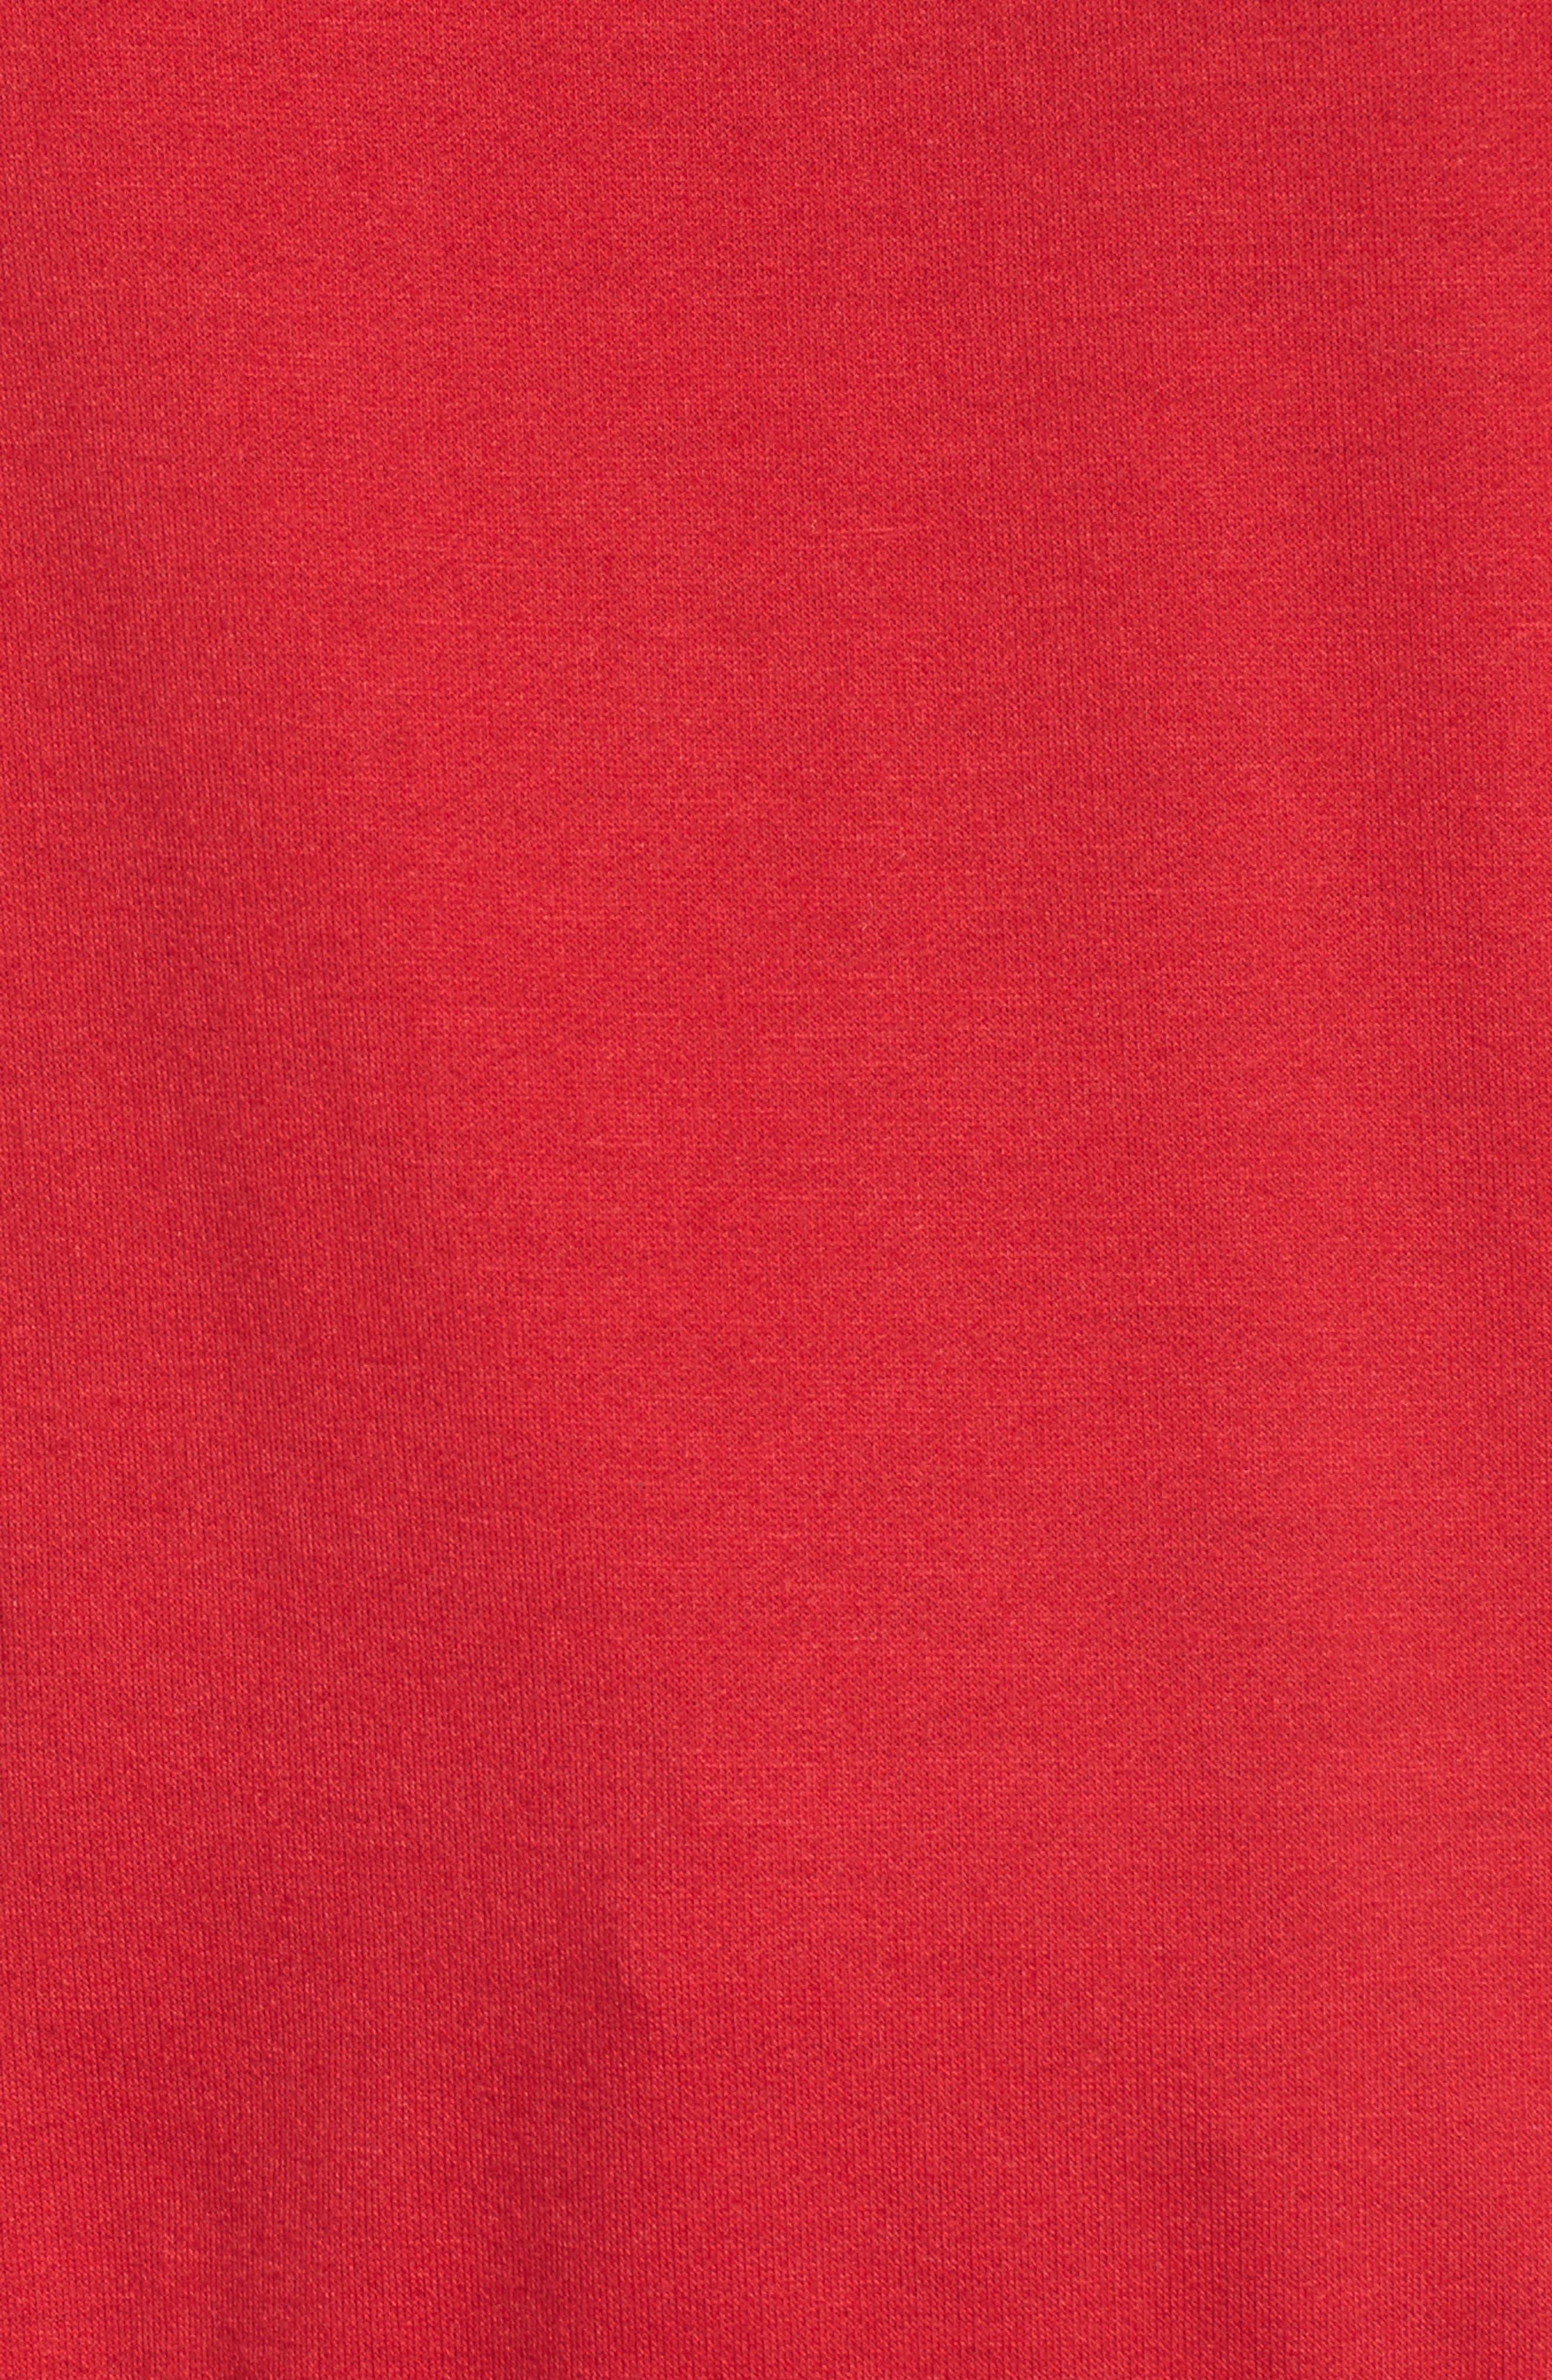 Team Rudolph Sweatshirt,                             Alternate thumbnail 5, color,                             Burgundy